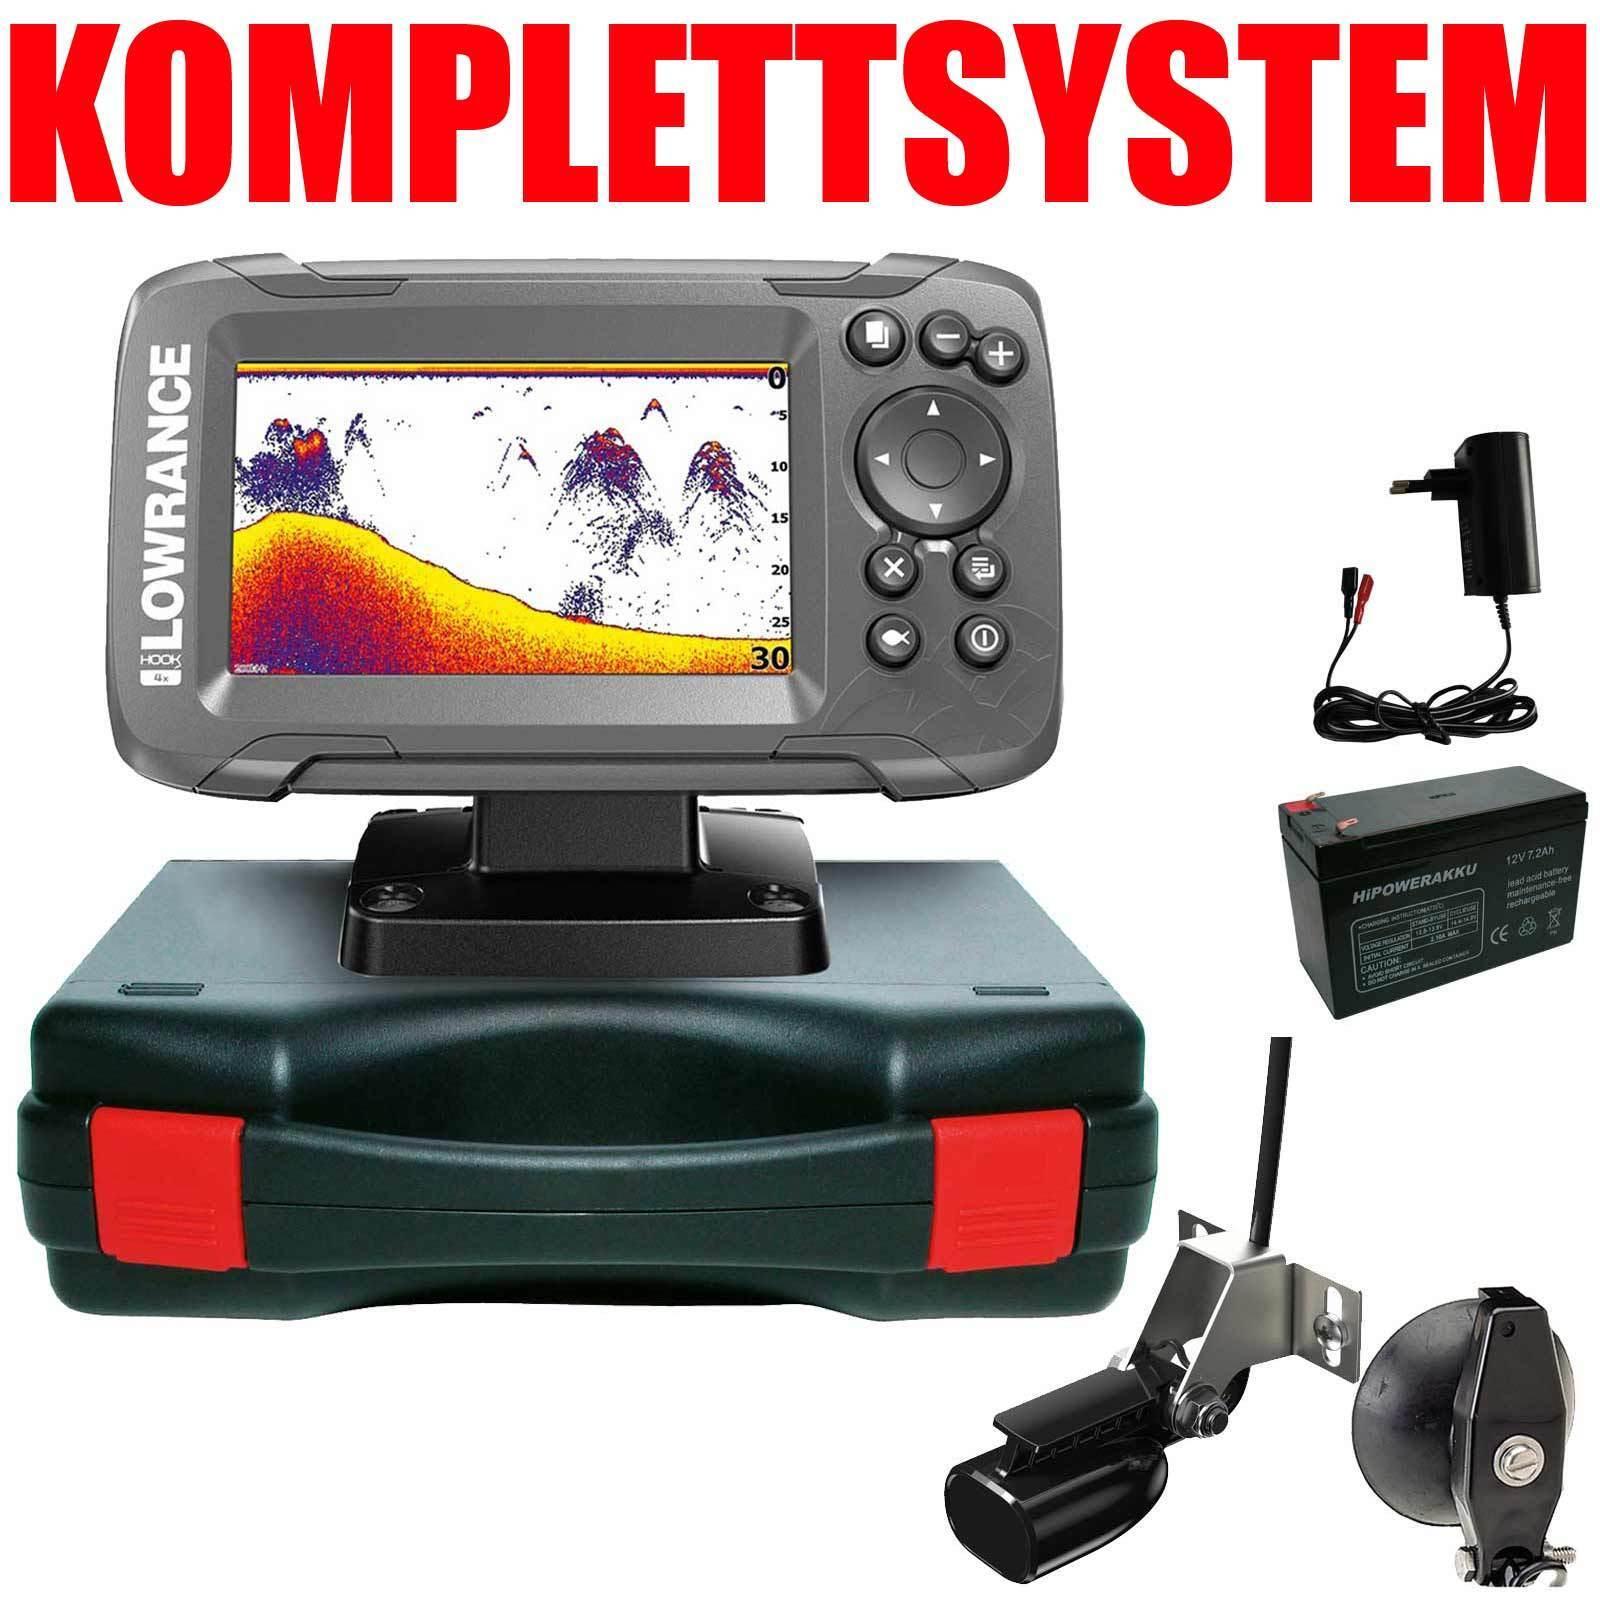 Lowrance Sonar Fish Finder Portable Basic Complete System-Hook 2 - 4x